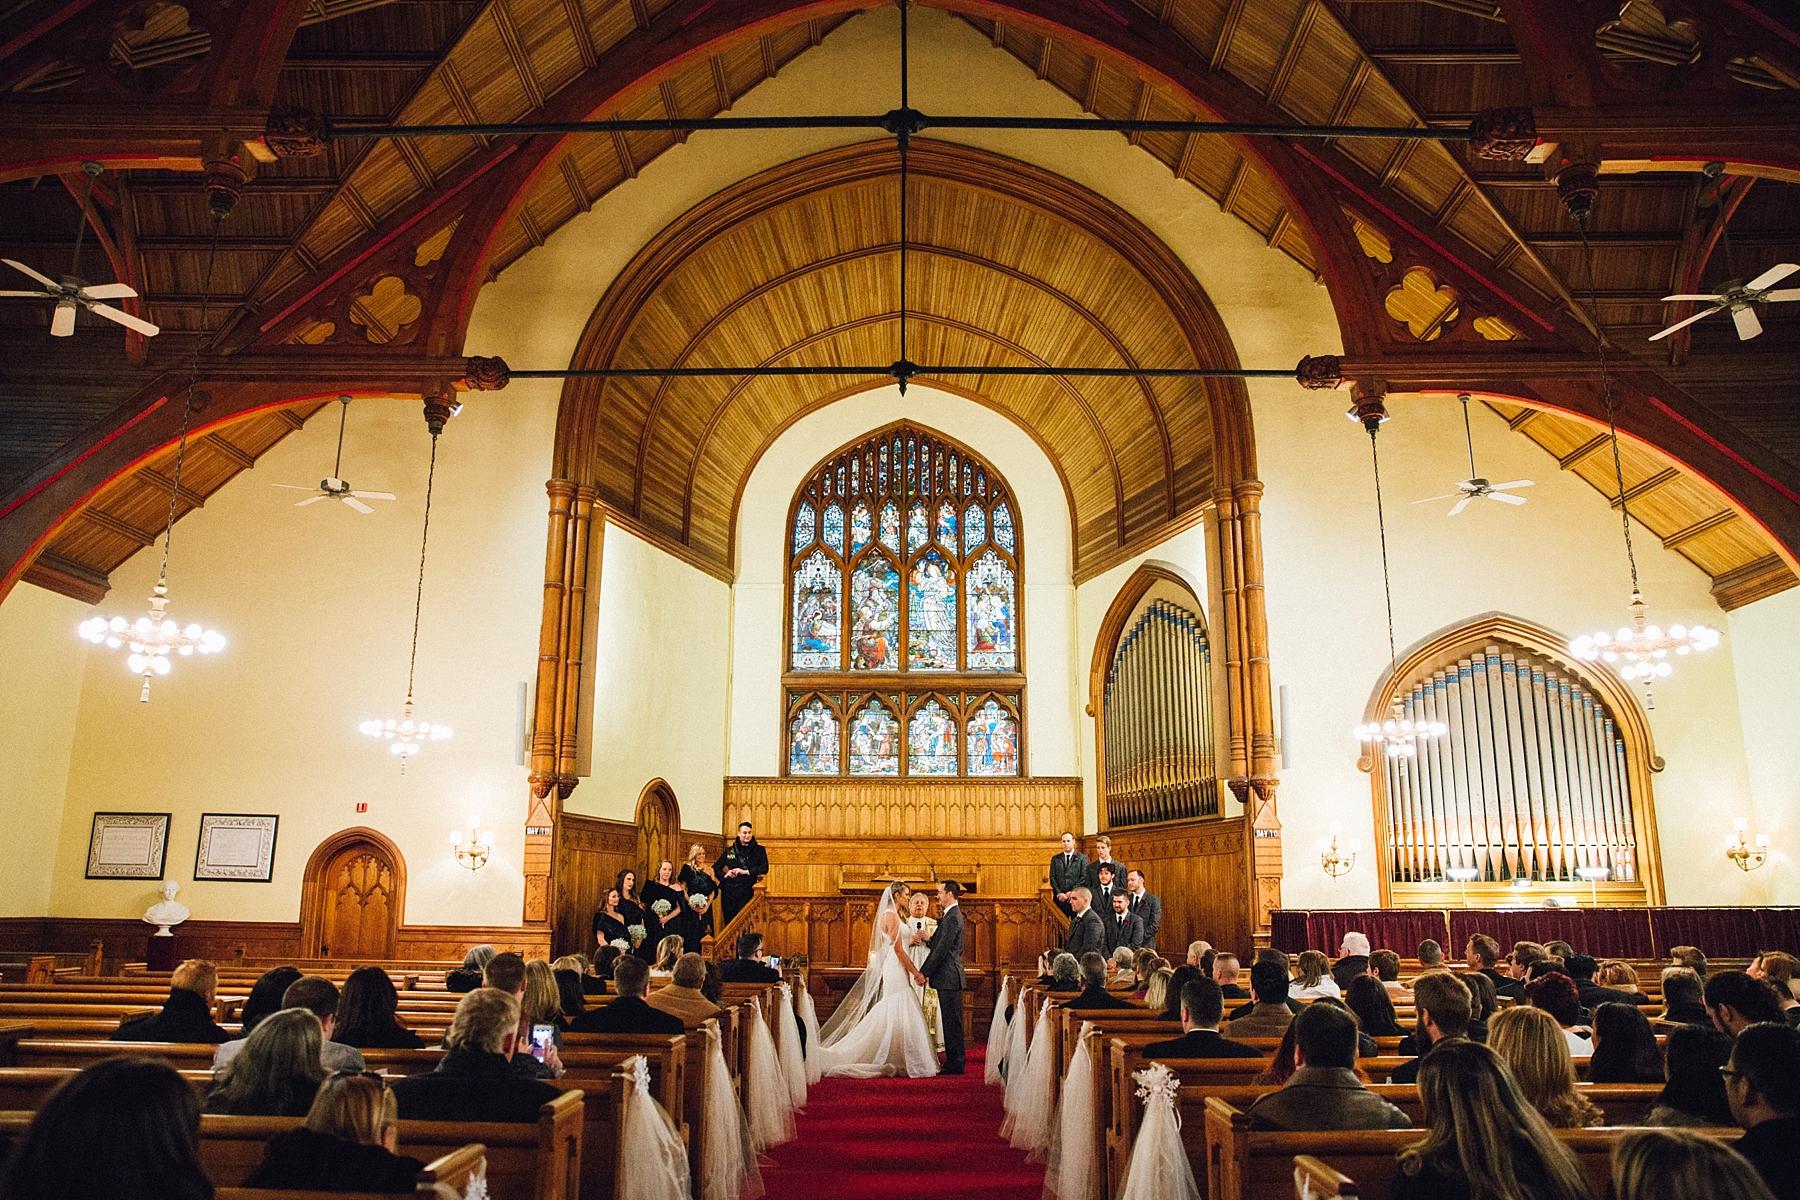 nj-monmouth-county-wedding-photographer-long-branch_0027.jpg